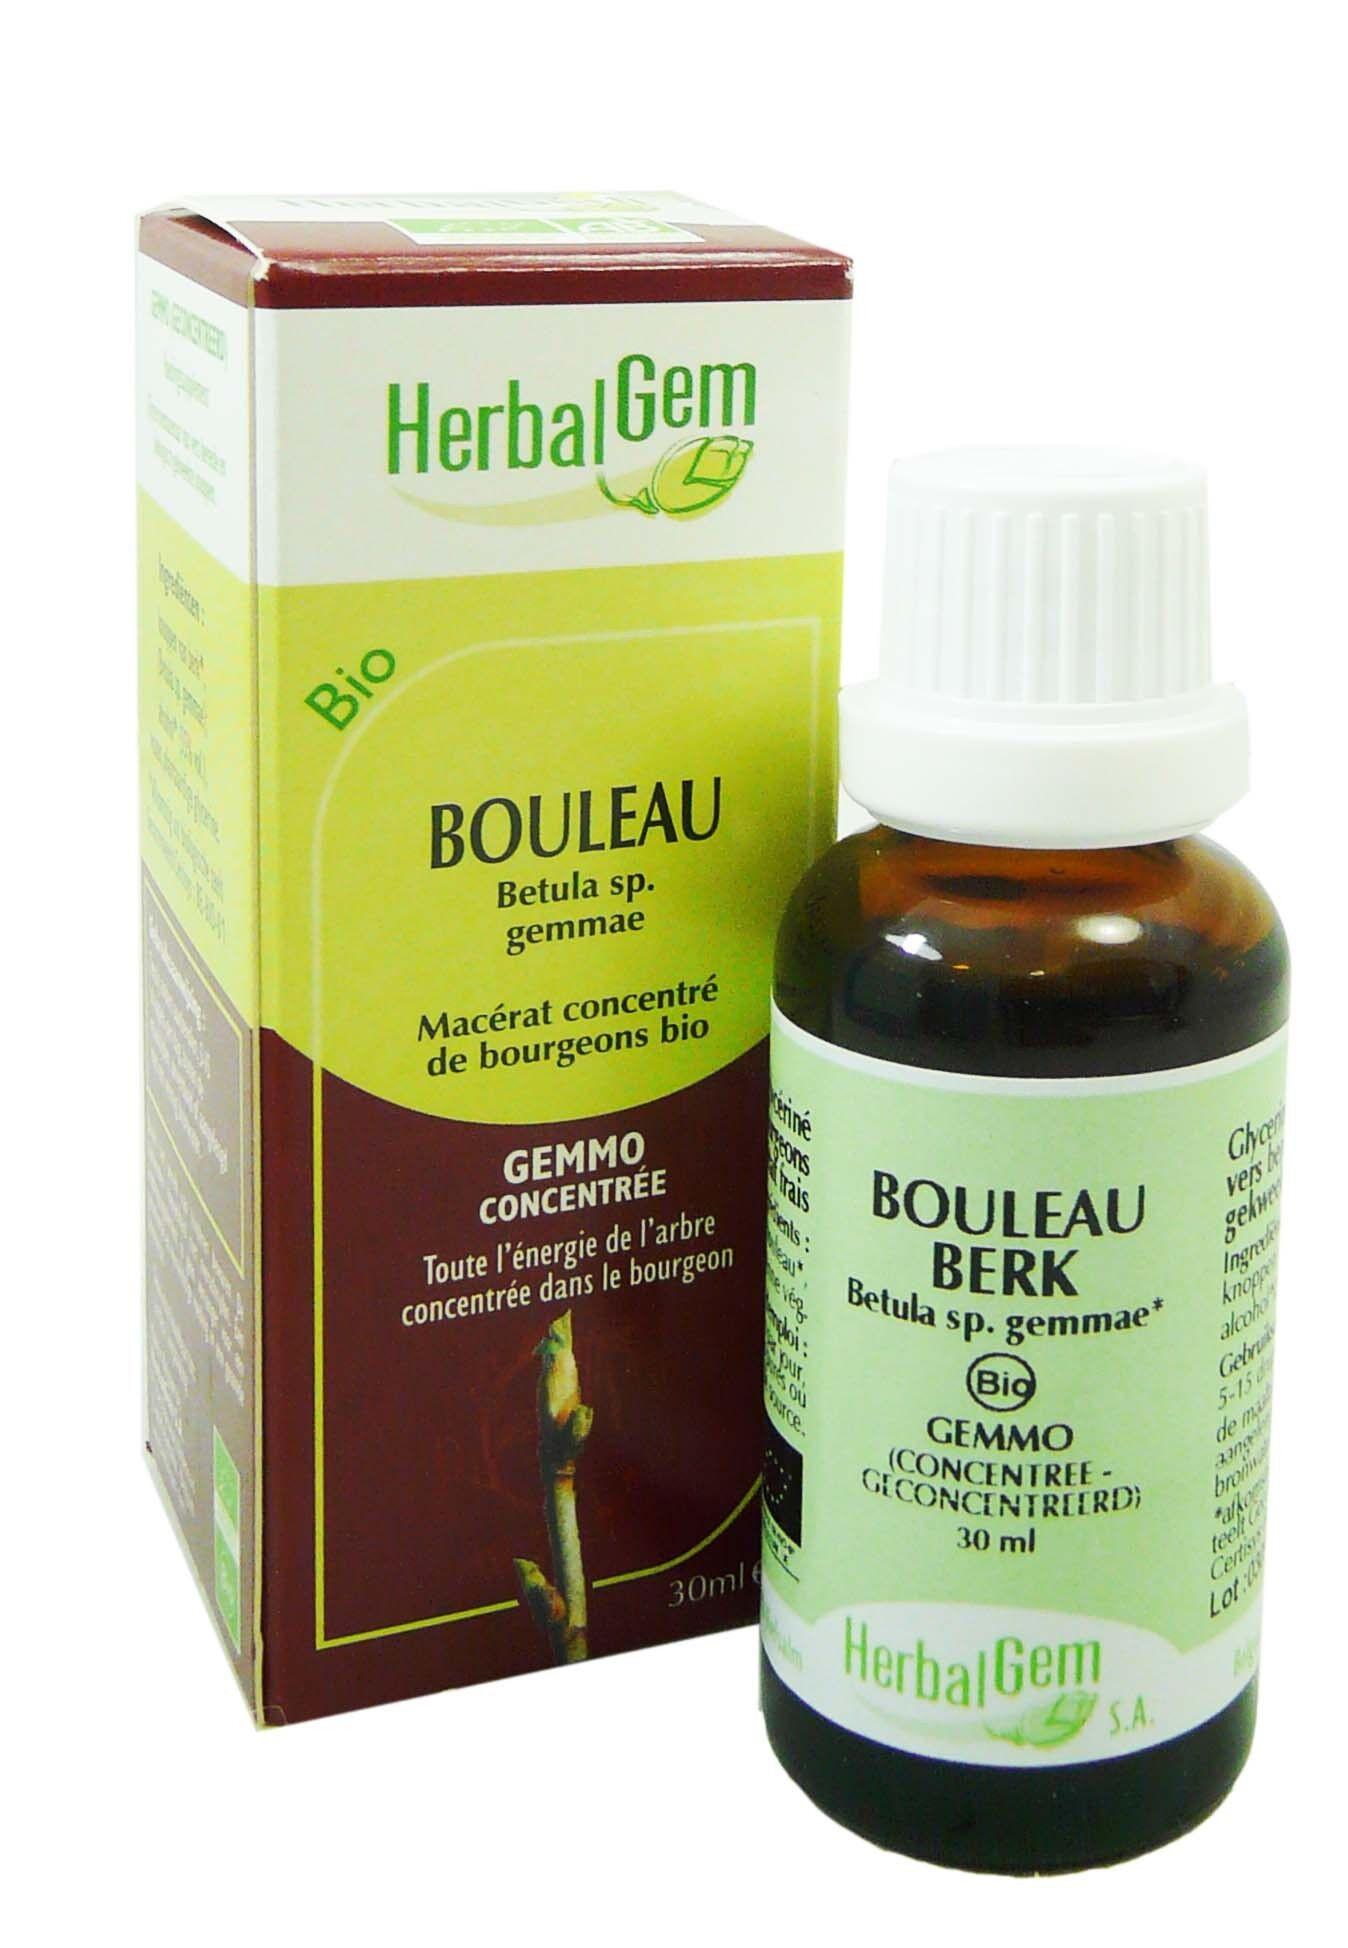 Herbalgem bio bouleau gemmo concentre 30ml